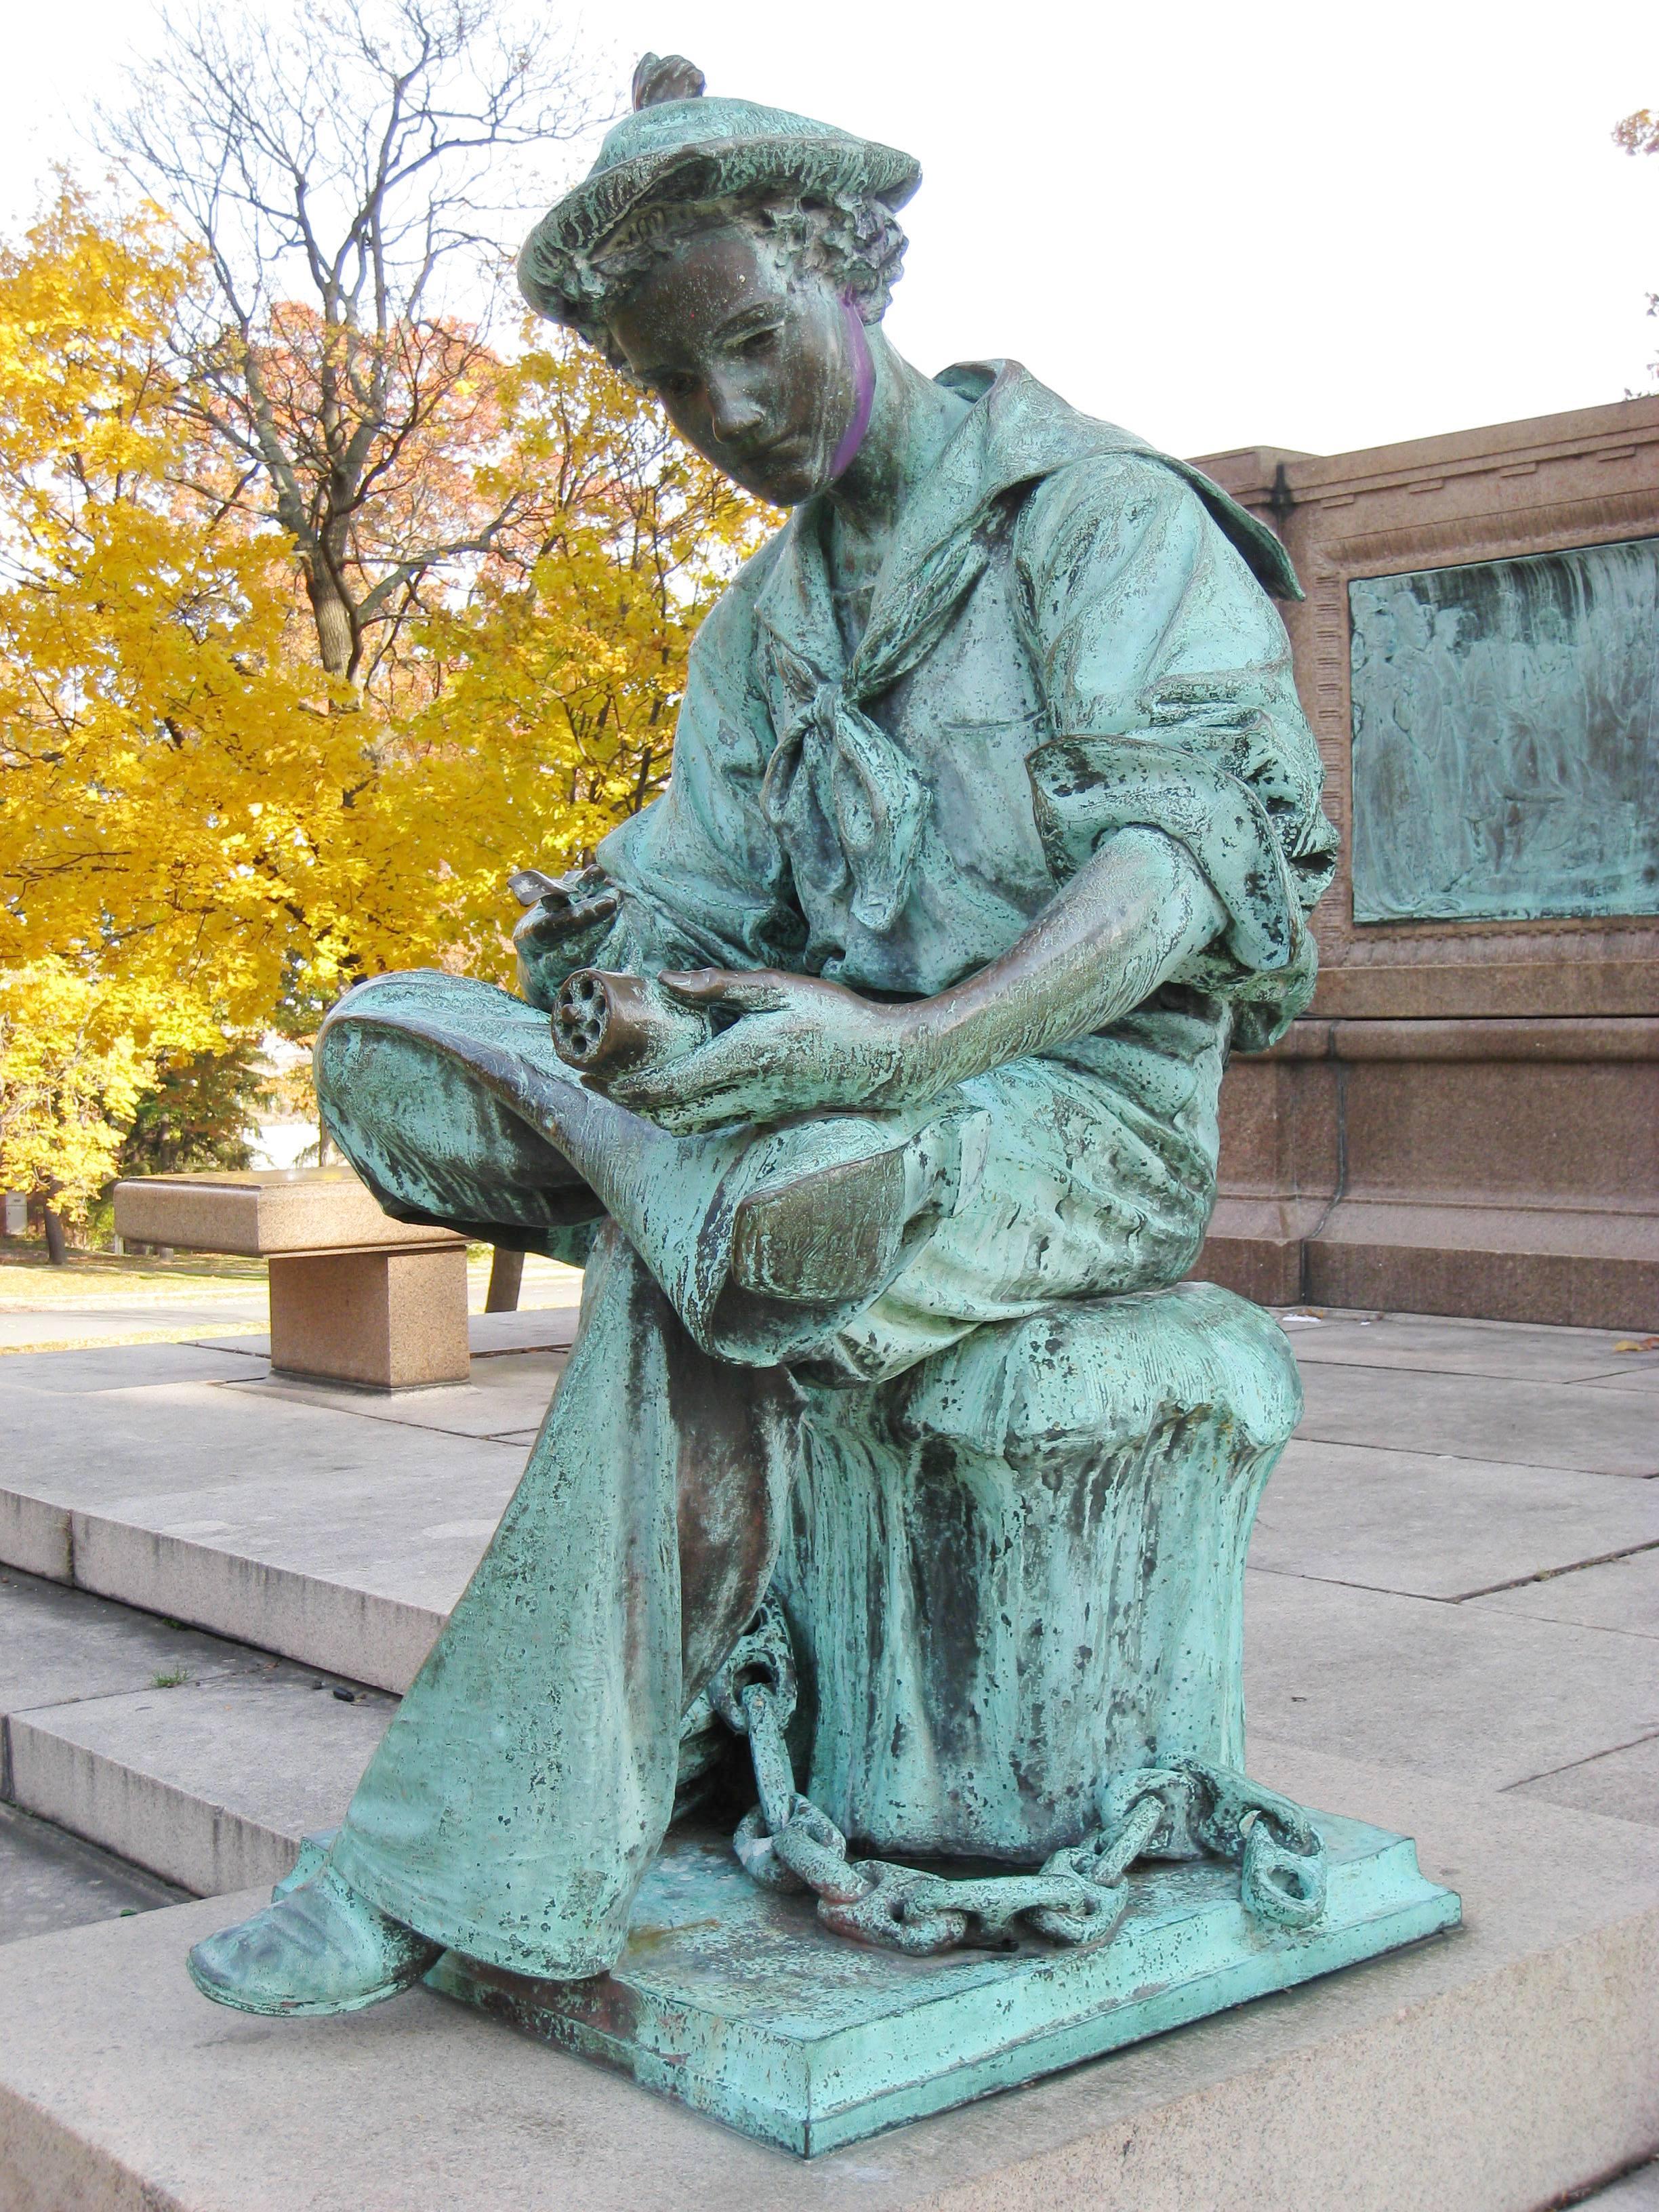 The Hartford At Work >> File:Samuel Colt Memorial, Hartford, CT - seated.JPG ...